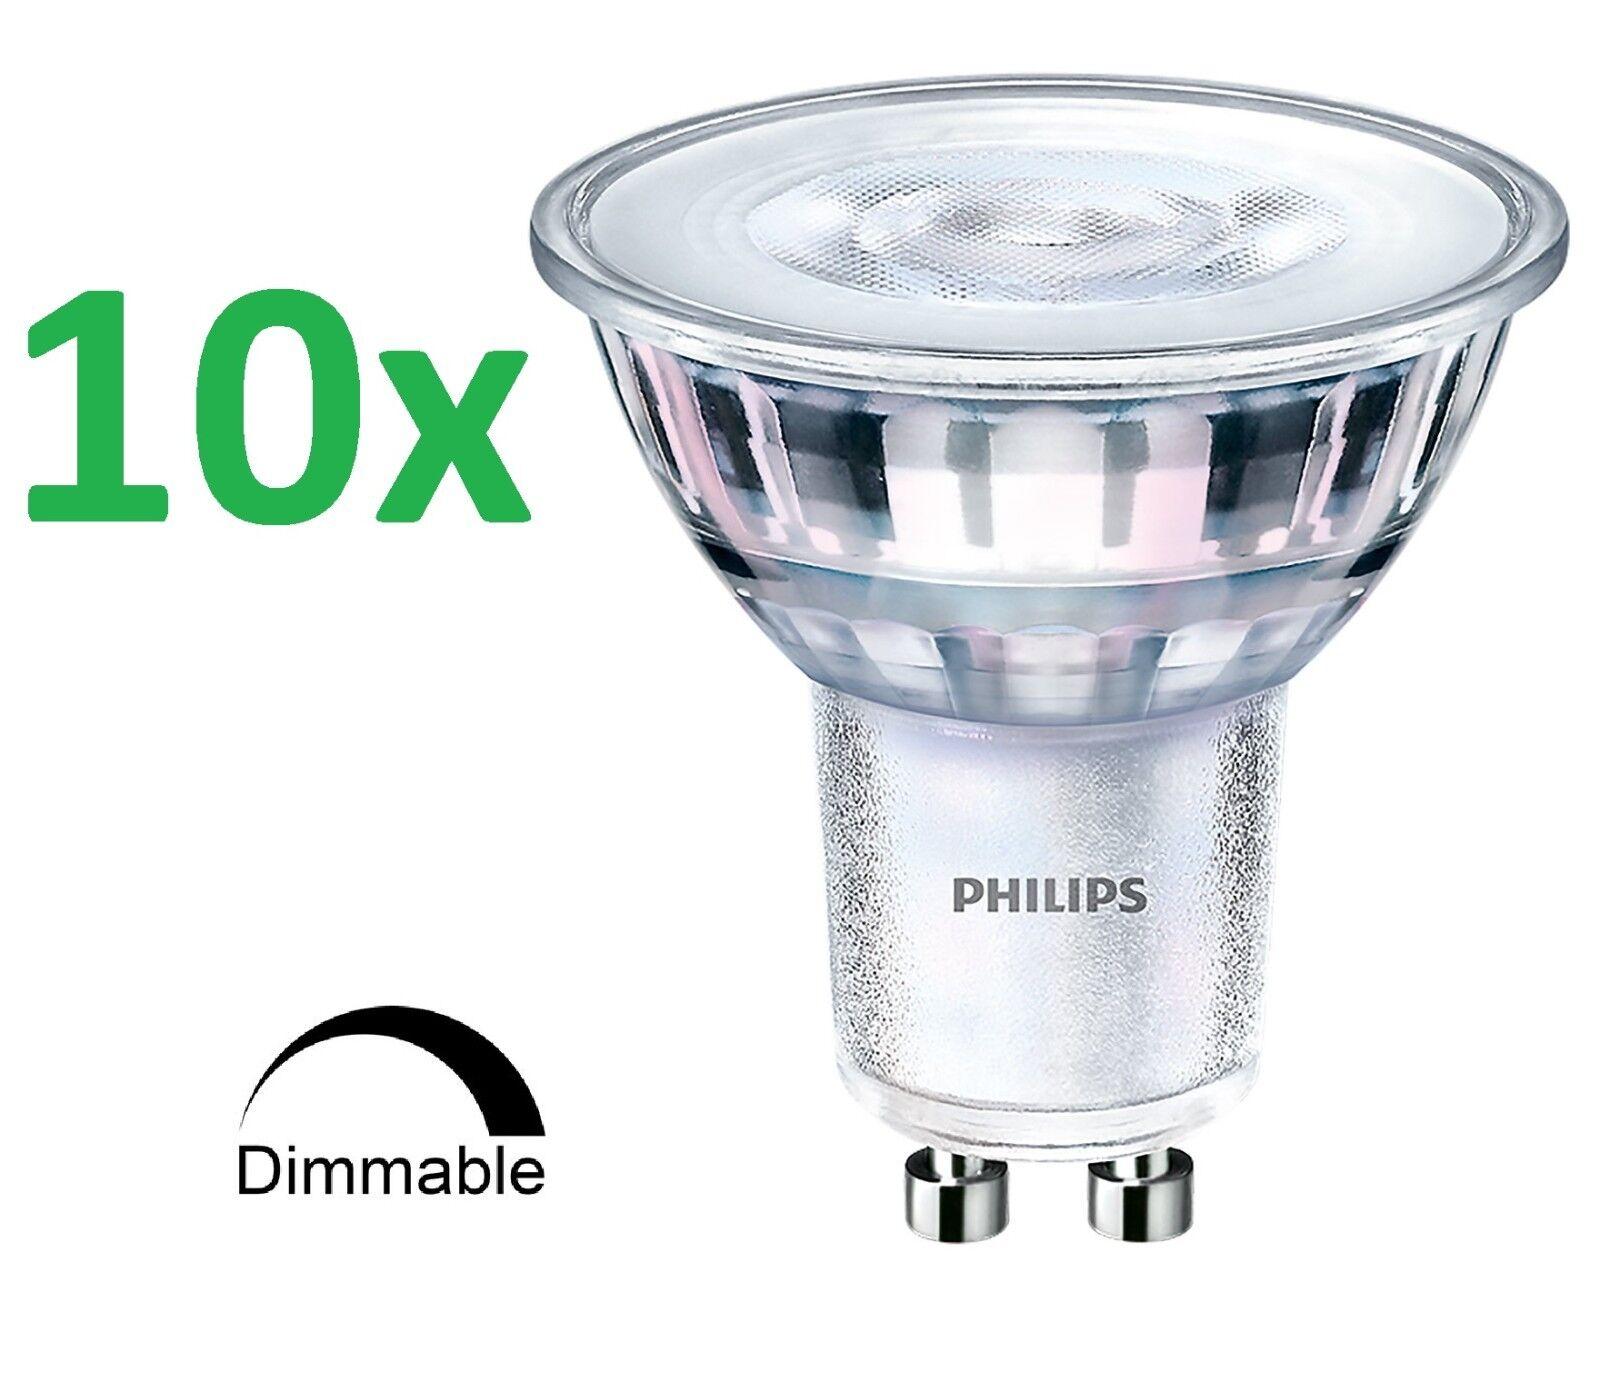 10x Master Philips LED spot emisor gu10 3,7-35w 2700 regulable ancha emisor 60d